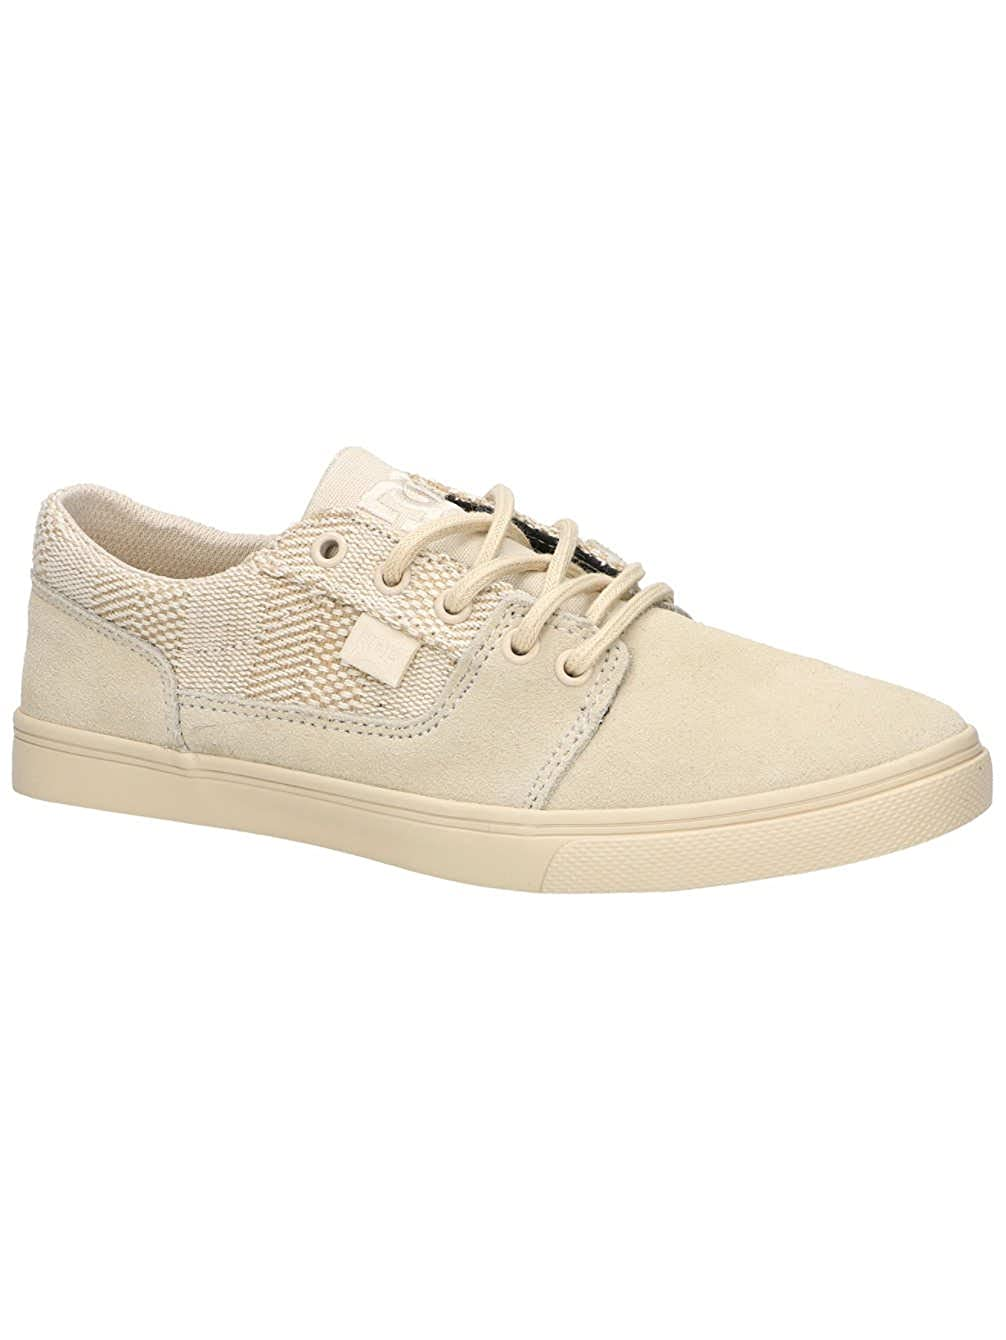 DC Shoes Tonik W Se, Sneakers Basses Femme ADJS300075